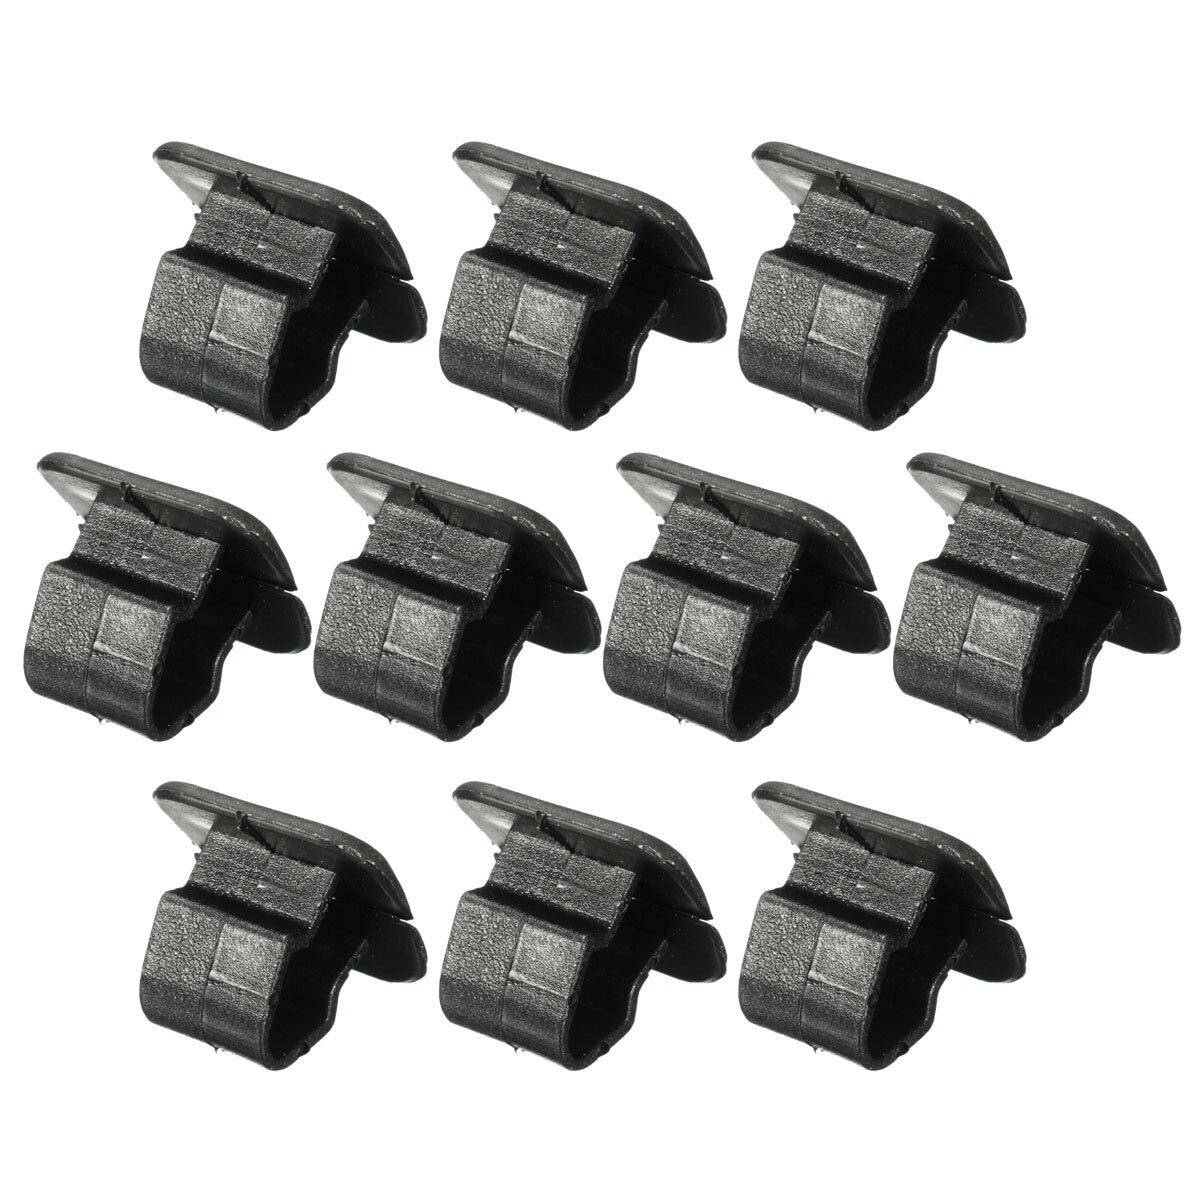 10 pçs capa de isolamento plástico retentor capô titular almofada clipe para vw 1h5863849a01c